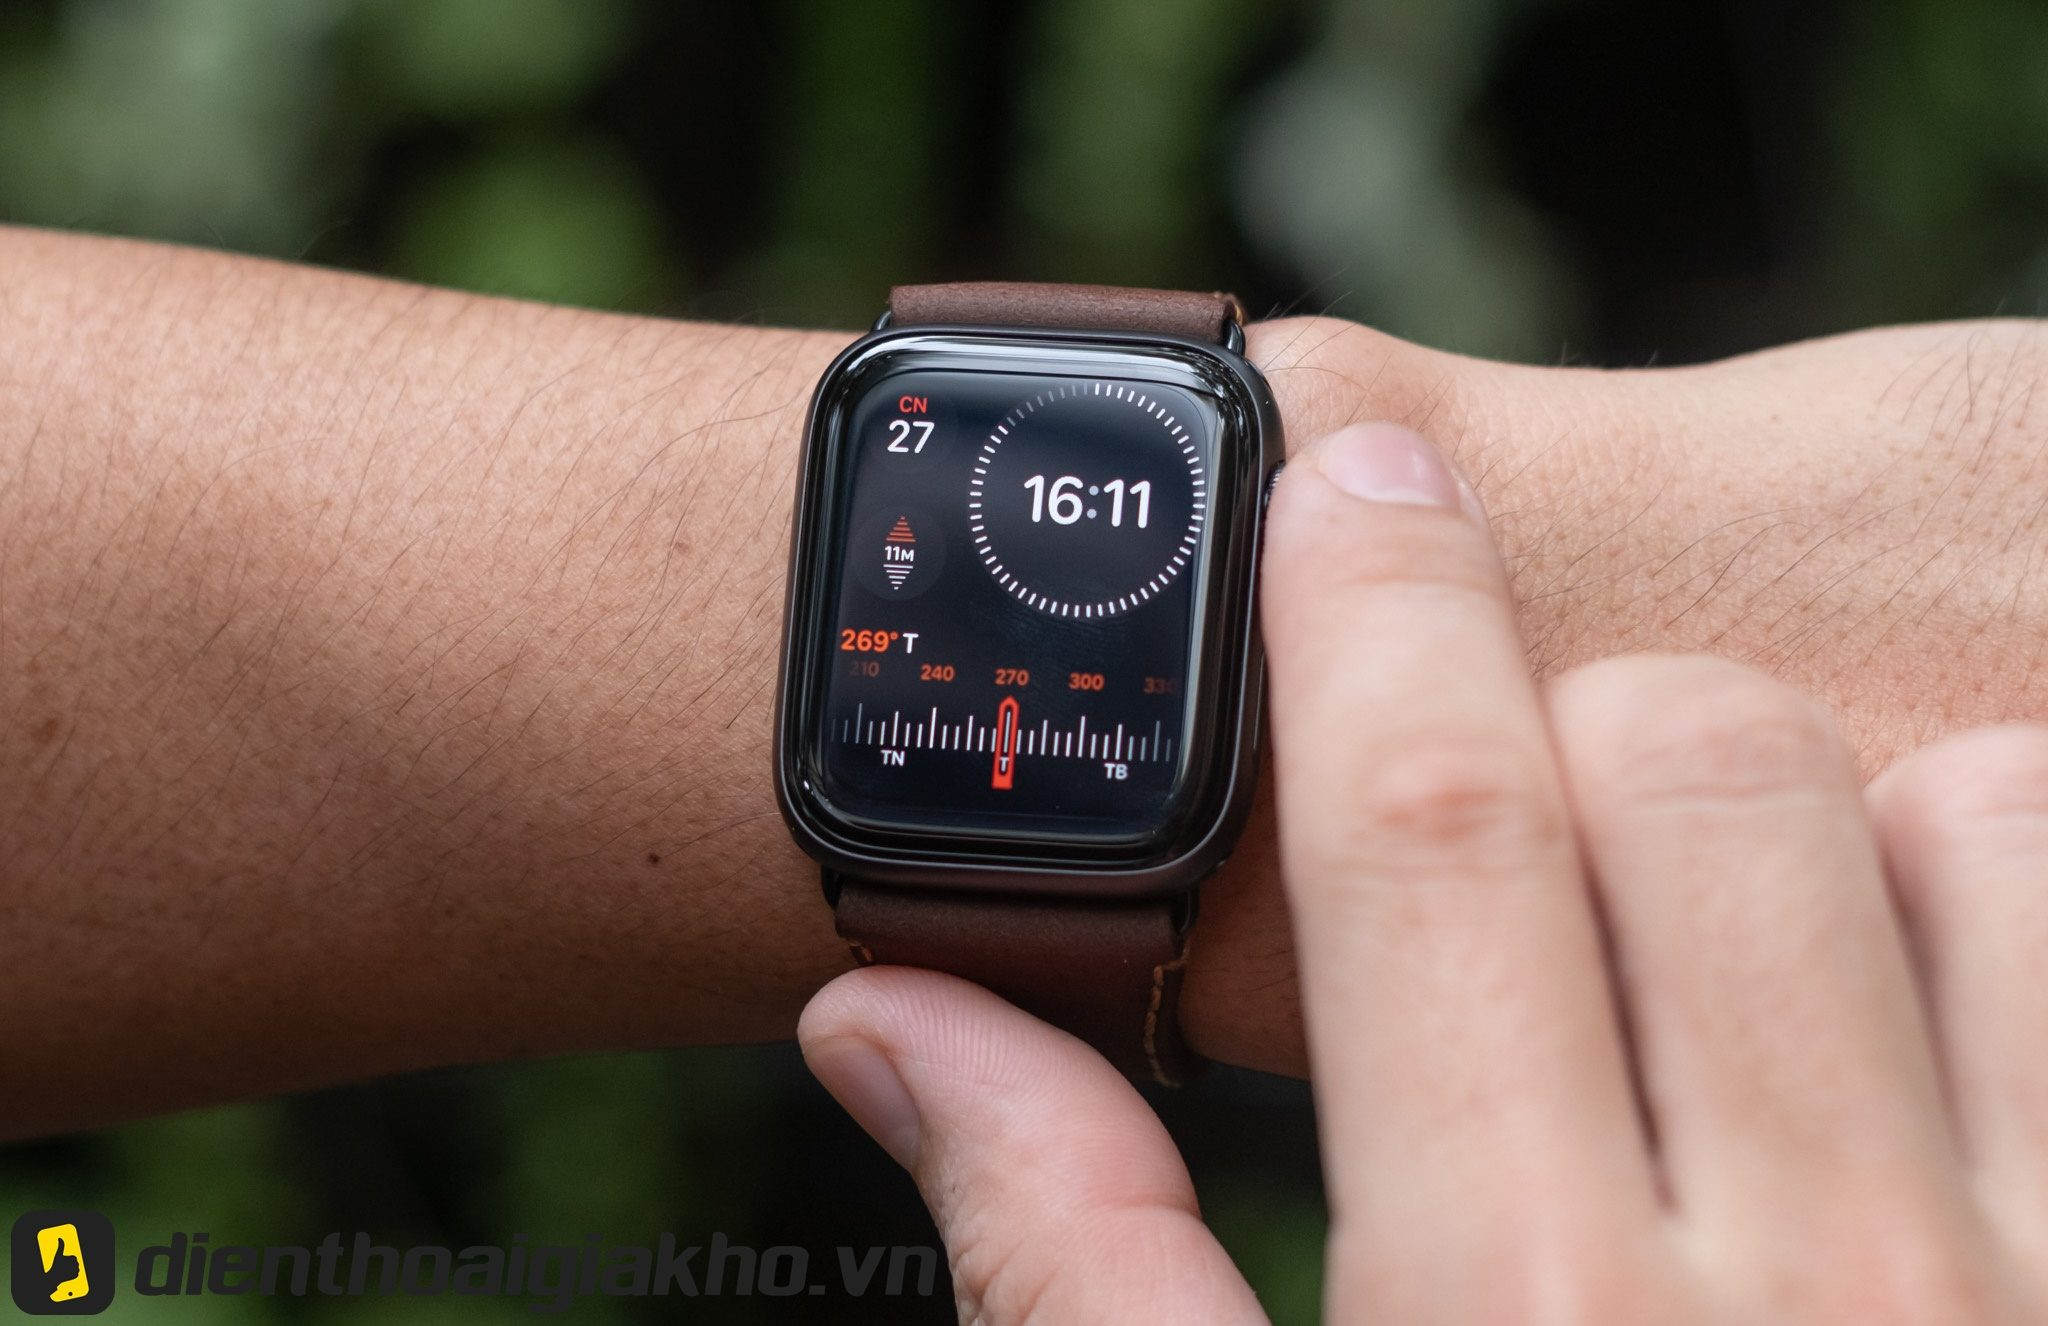 Mua Apple Watch SE 44mm GPS Aluminum cũ